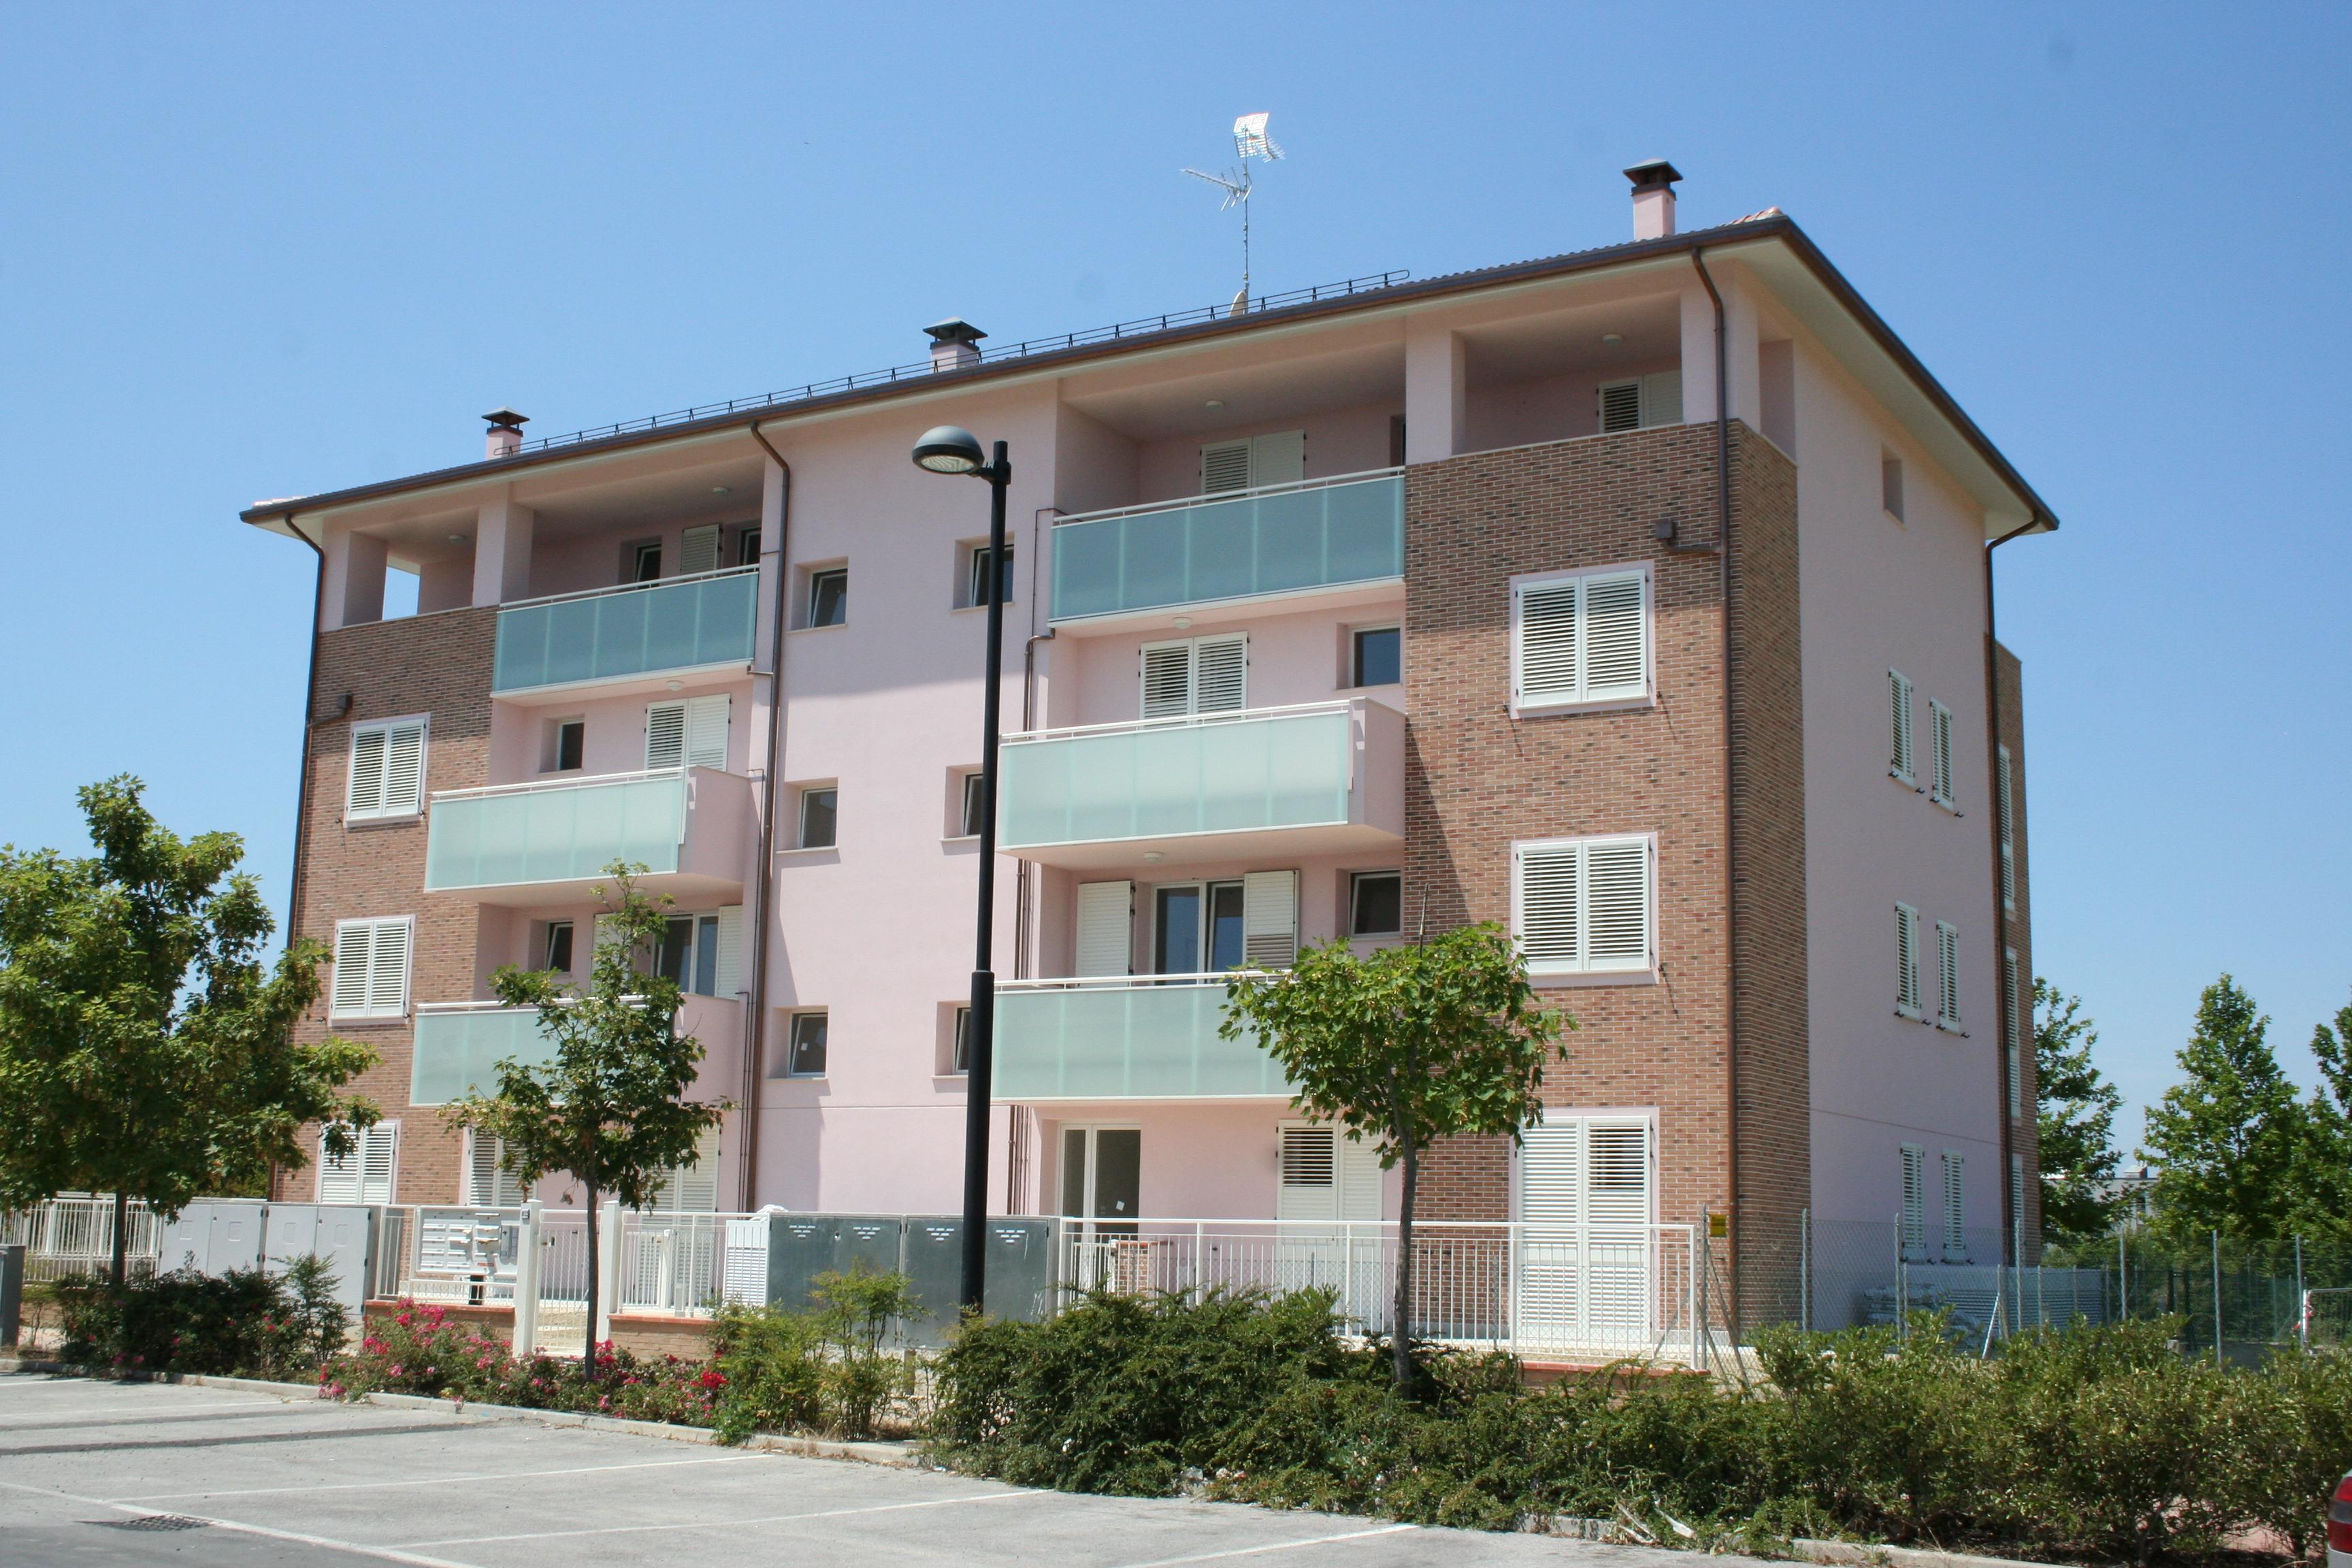 Faenza (RA), Via G. Boschi 102